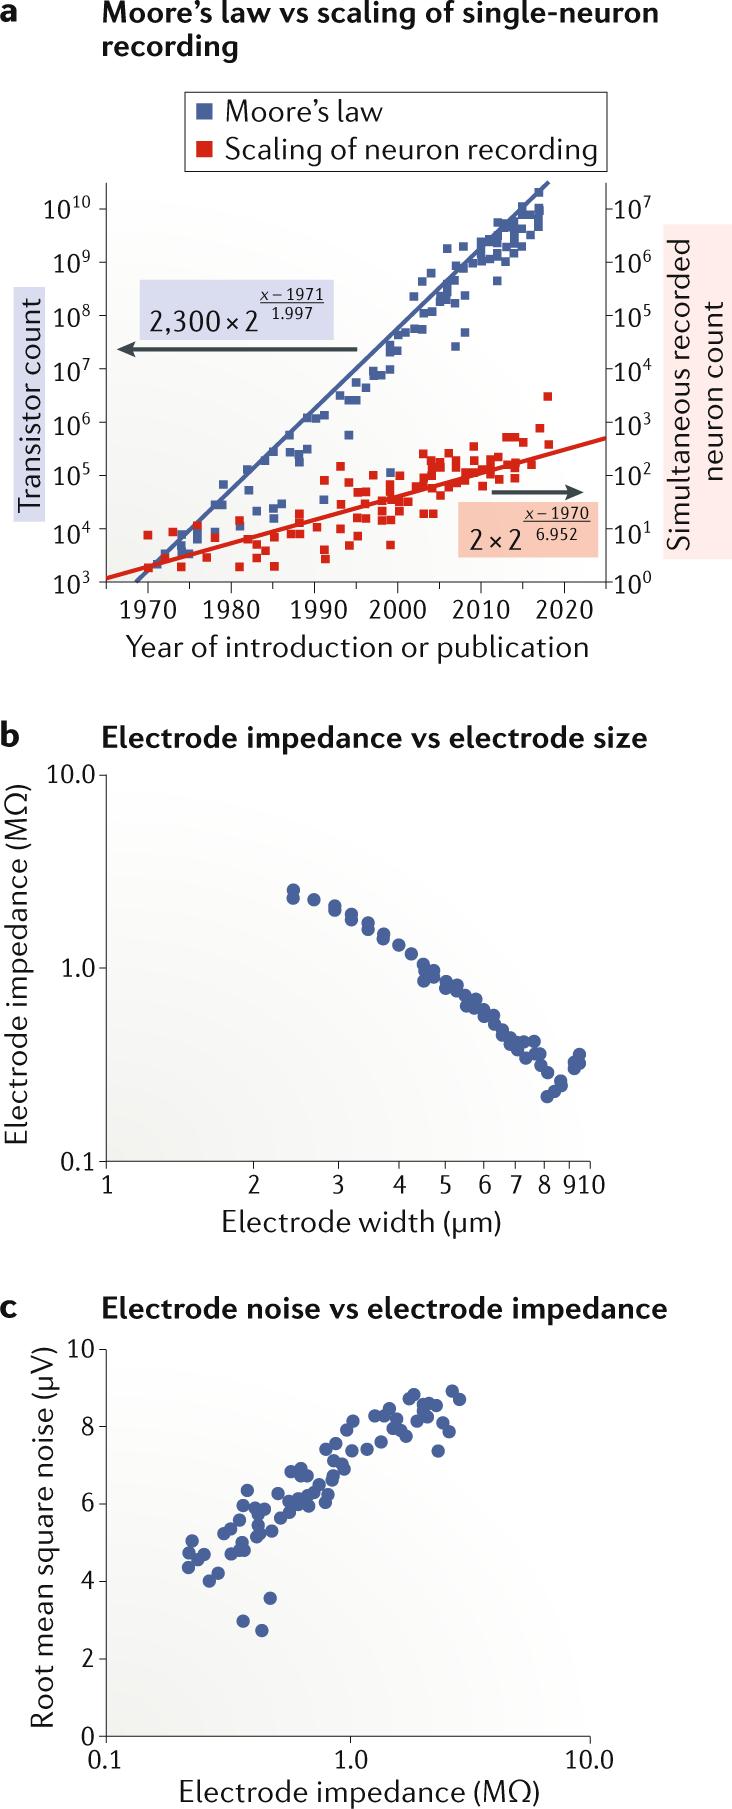 Novel electrode technologies for neural recordings | Nature